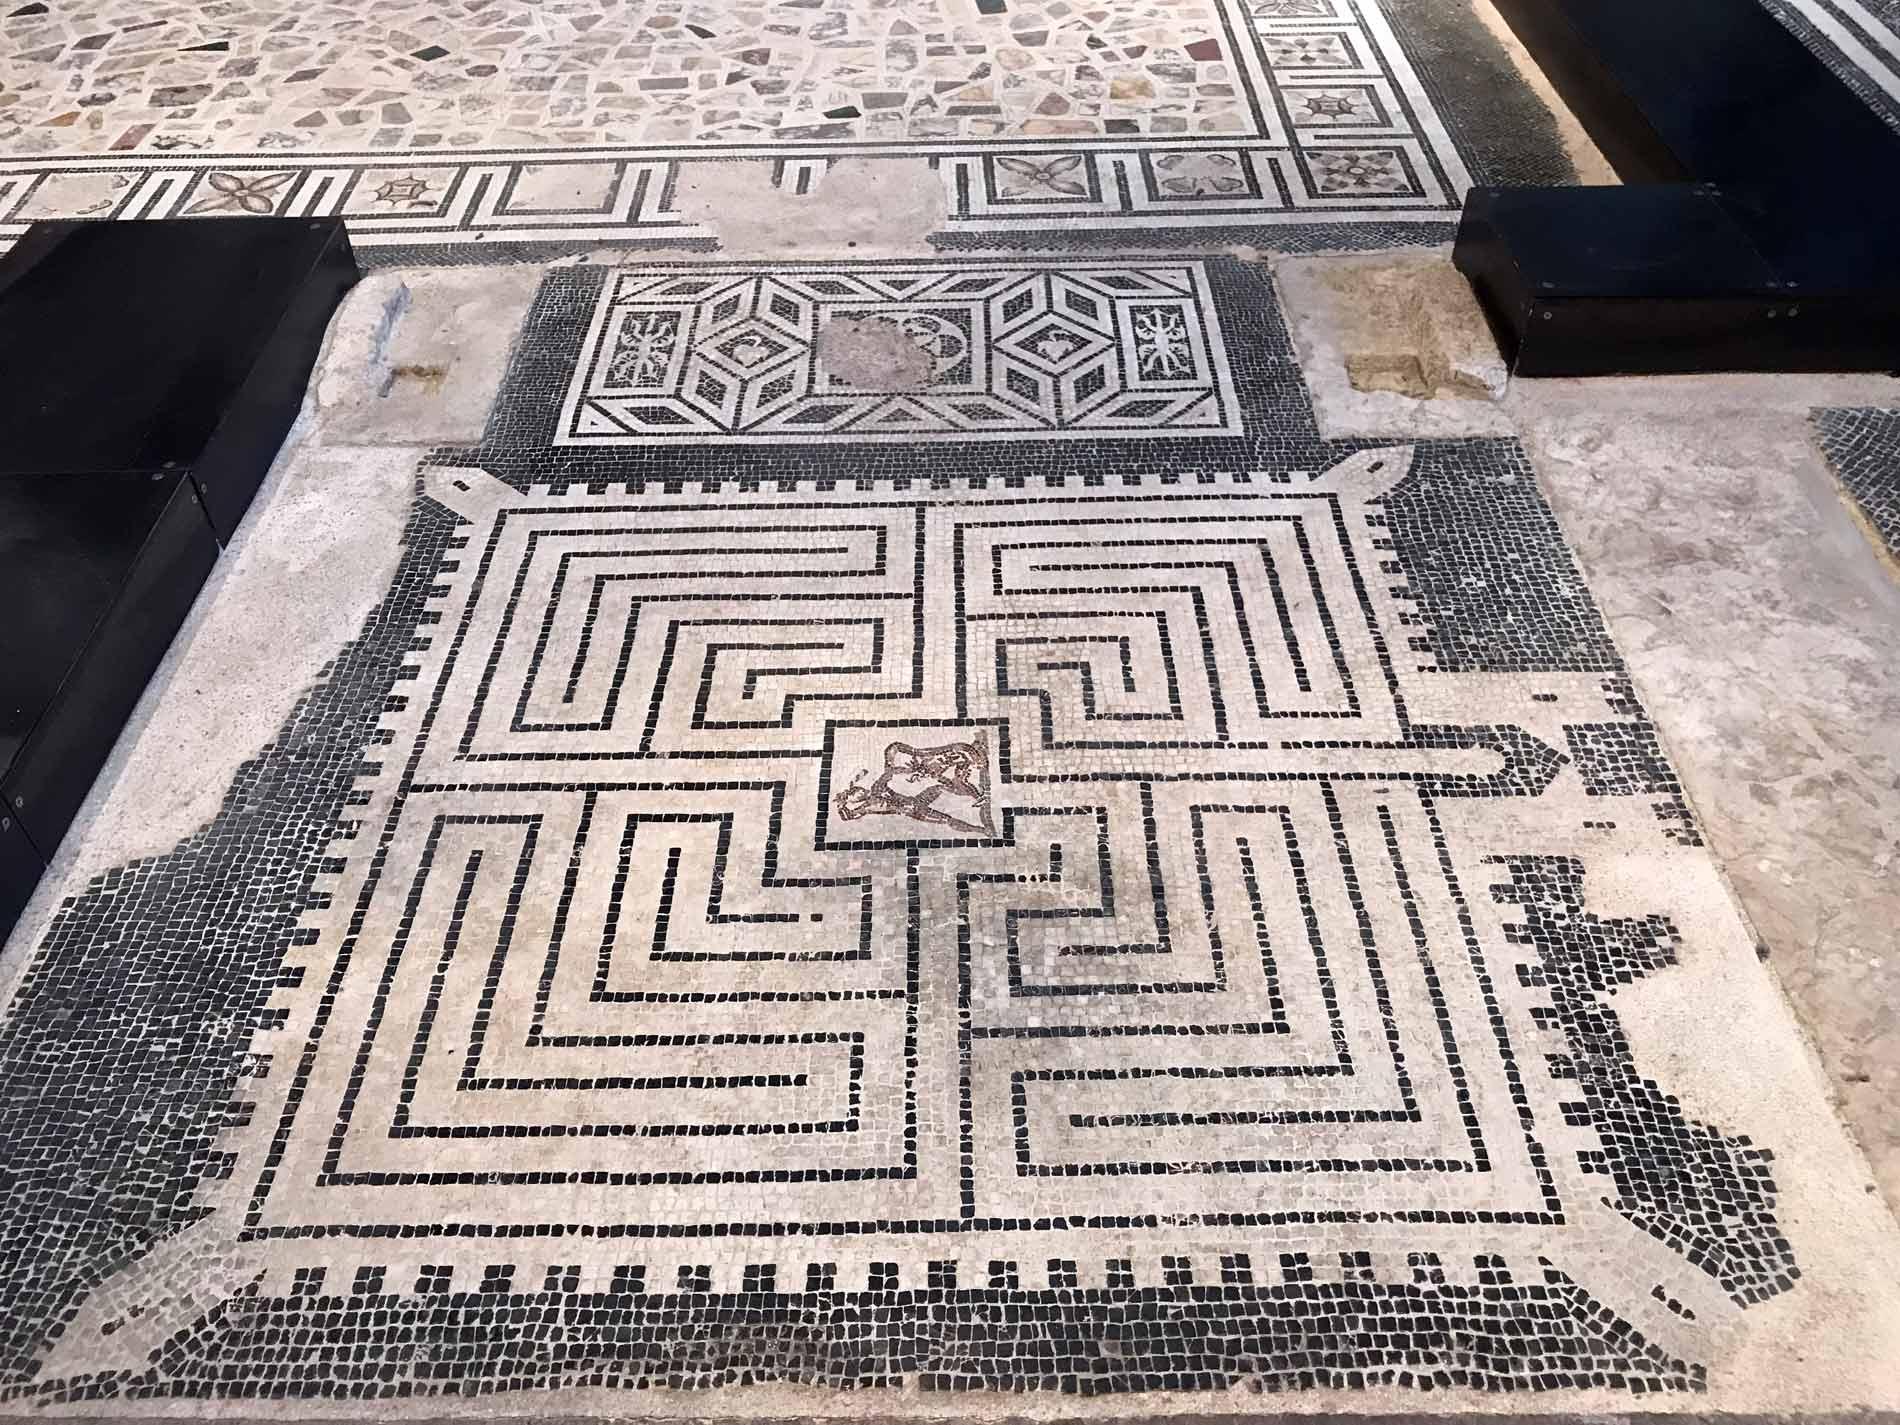 Museo-archeologico-Cremona-chiesa-San-Lorenzo-mosaici-pavimentali-romani